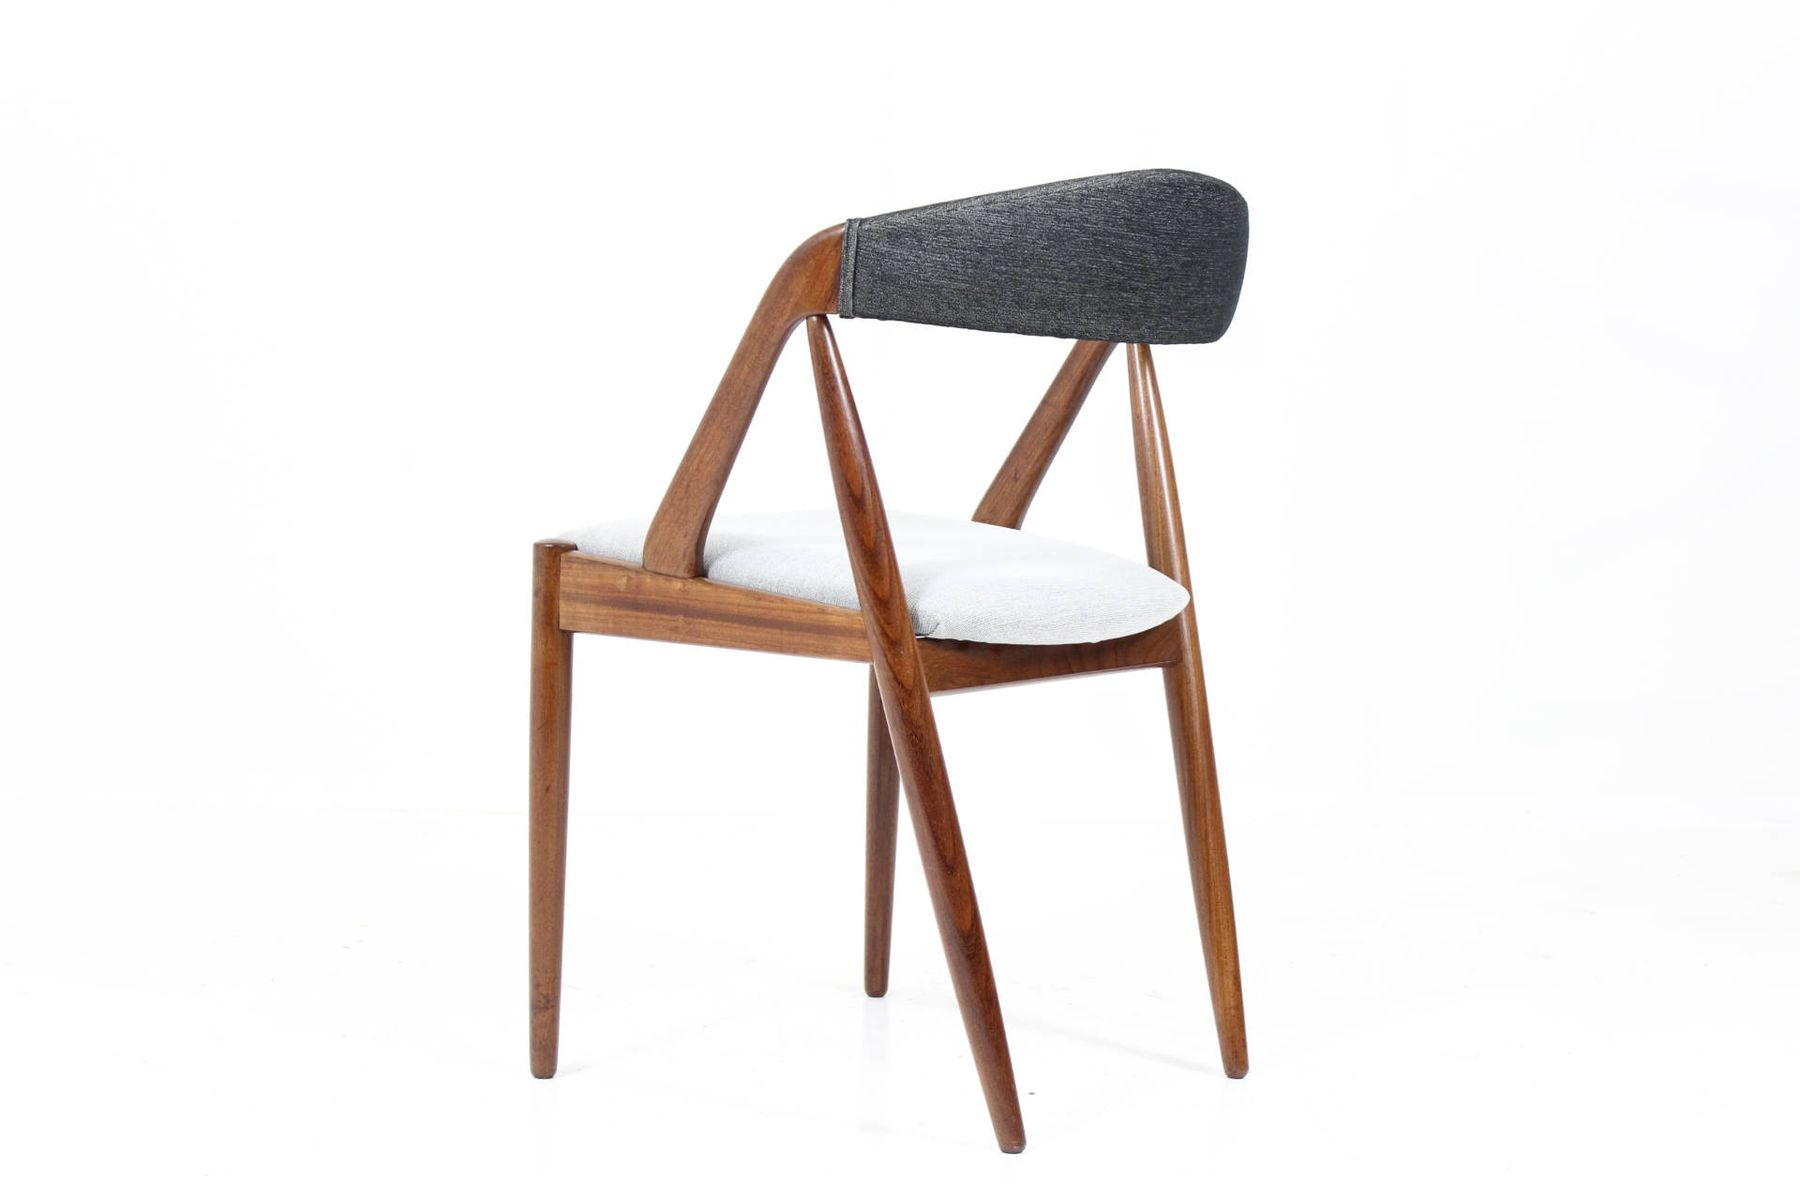 Vintage no 31 chair by kai kristiansen for schou andersen - Kai kristiansen chair ...